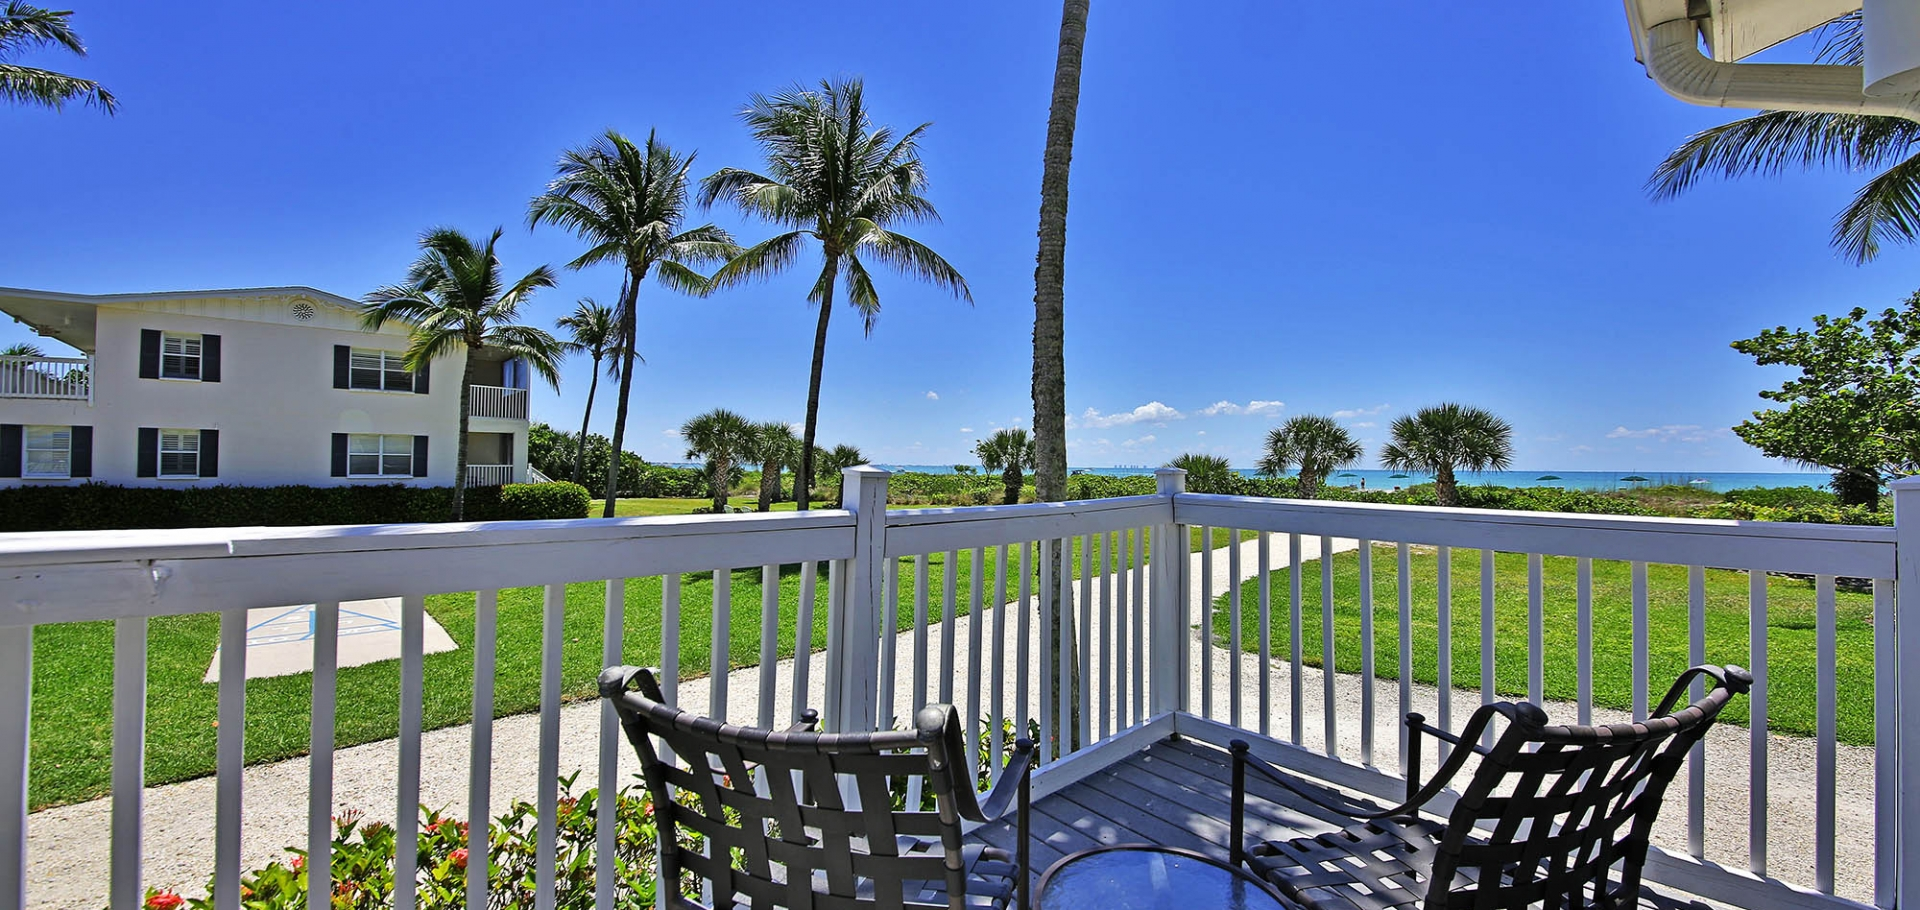 Seaside Inn patio views